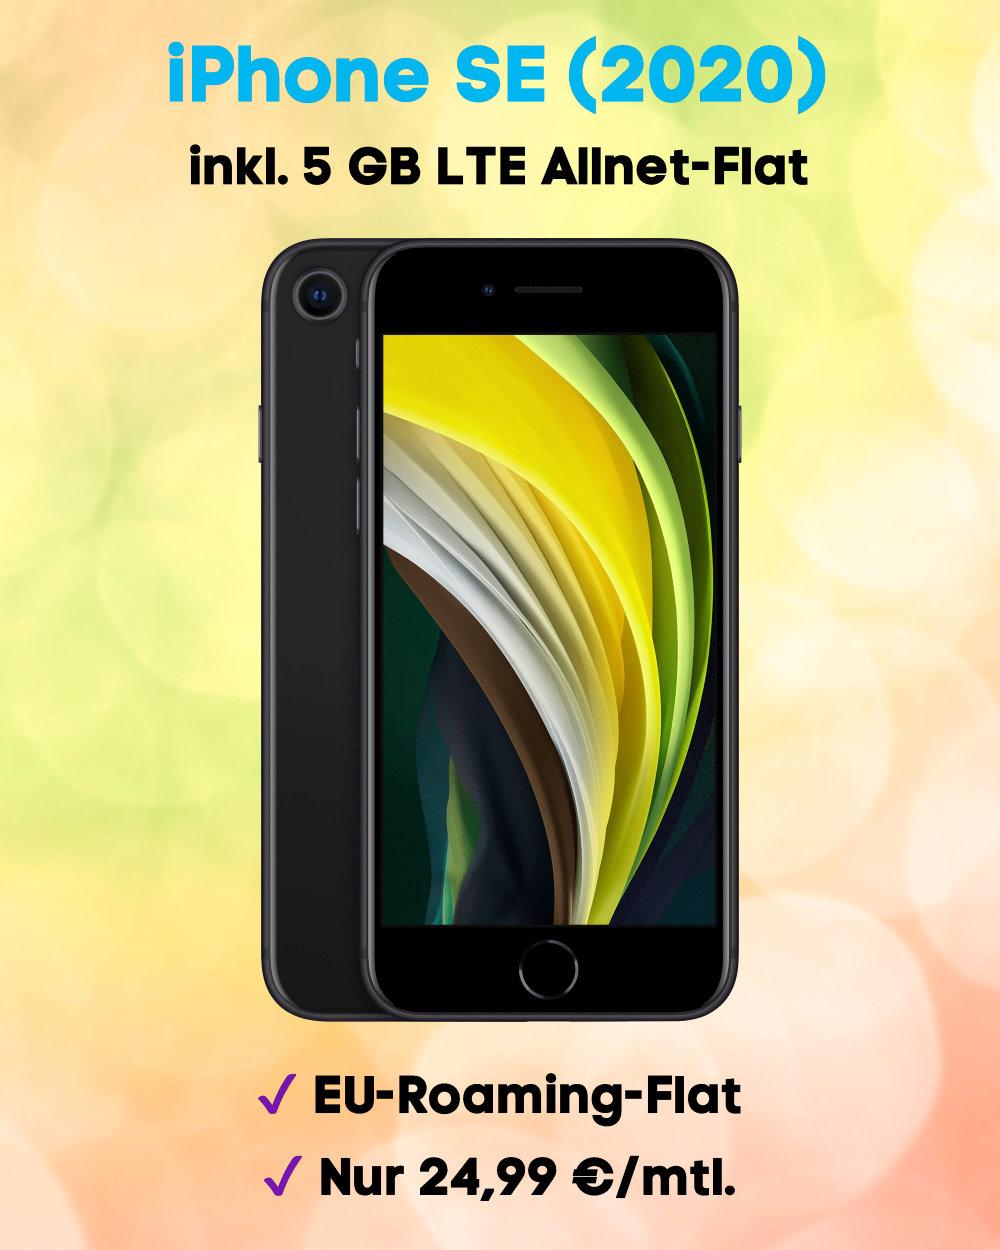 iPhone SE 2020 inkl. 5 GB LTE Allnet-Flat Handytarif